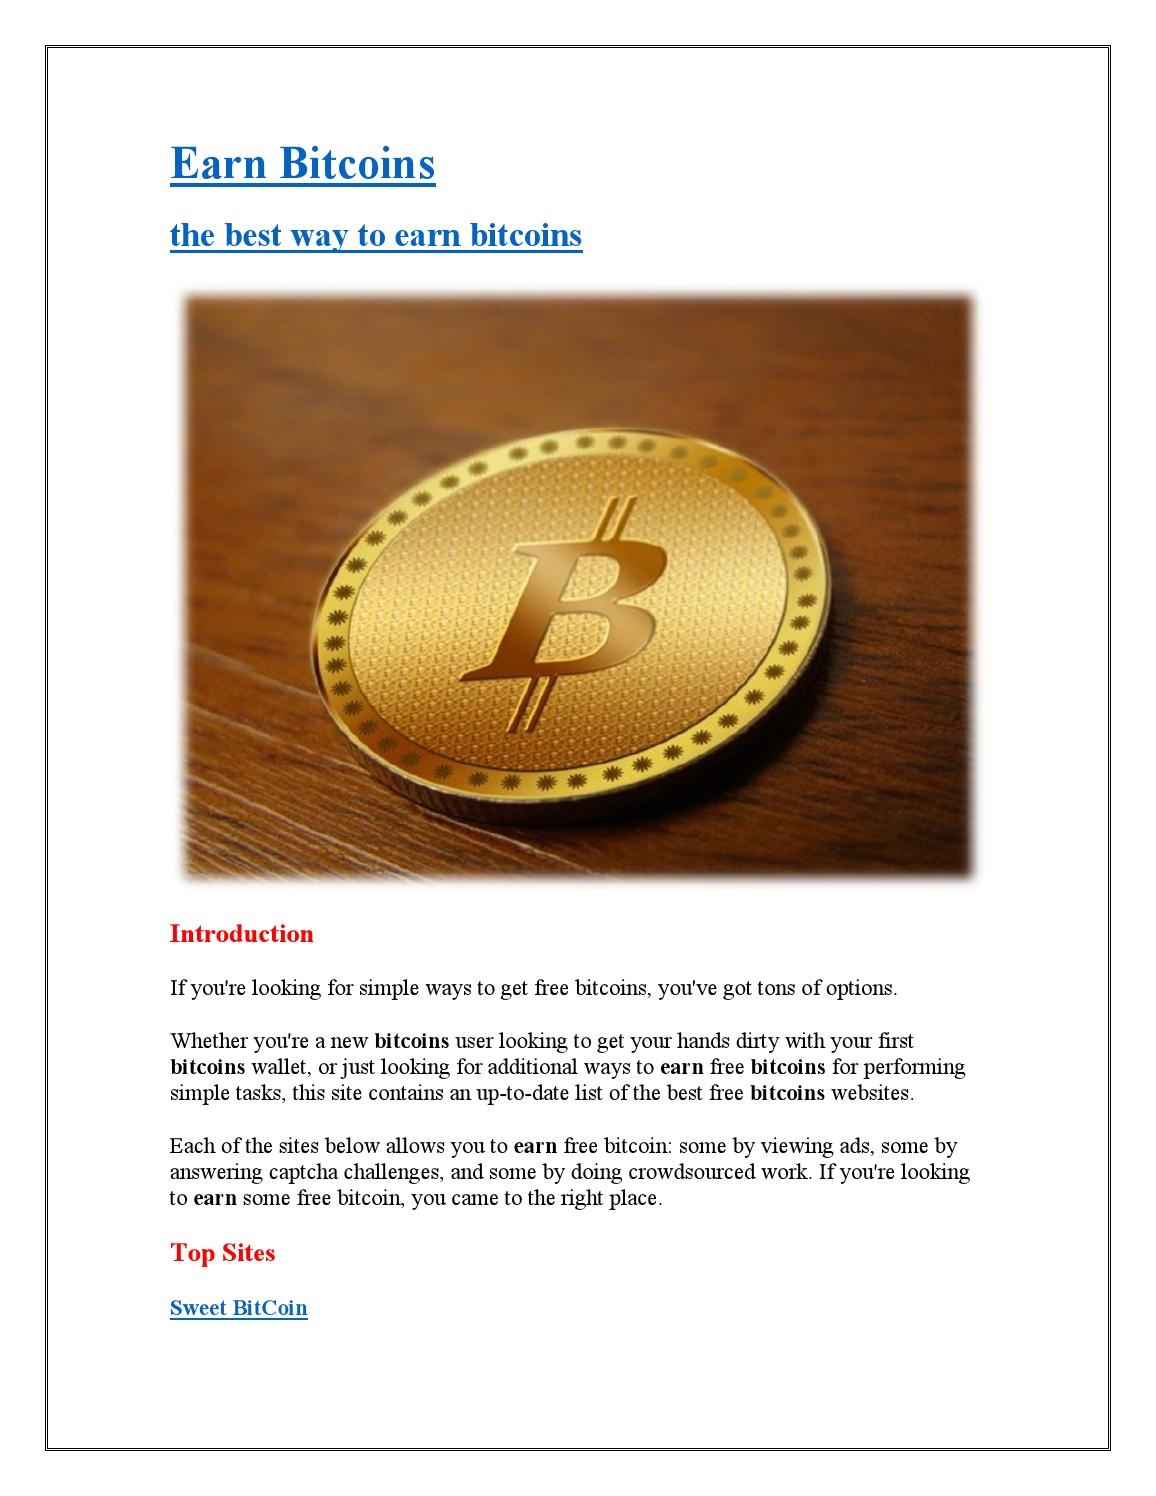 Dirty bitcoins for free ater powolny bitcoins